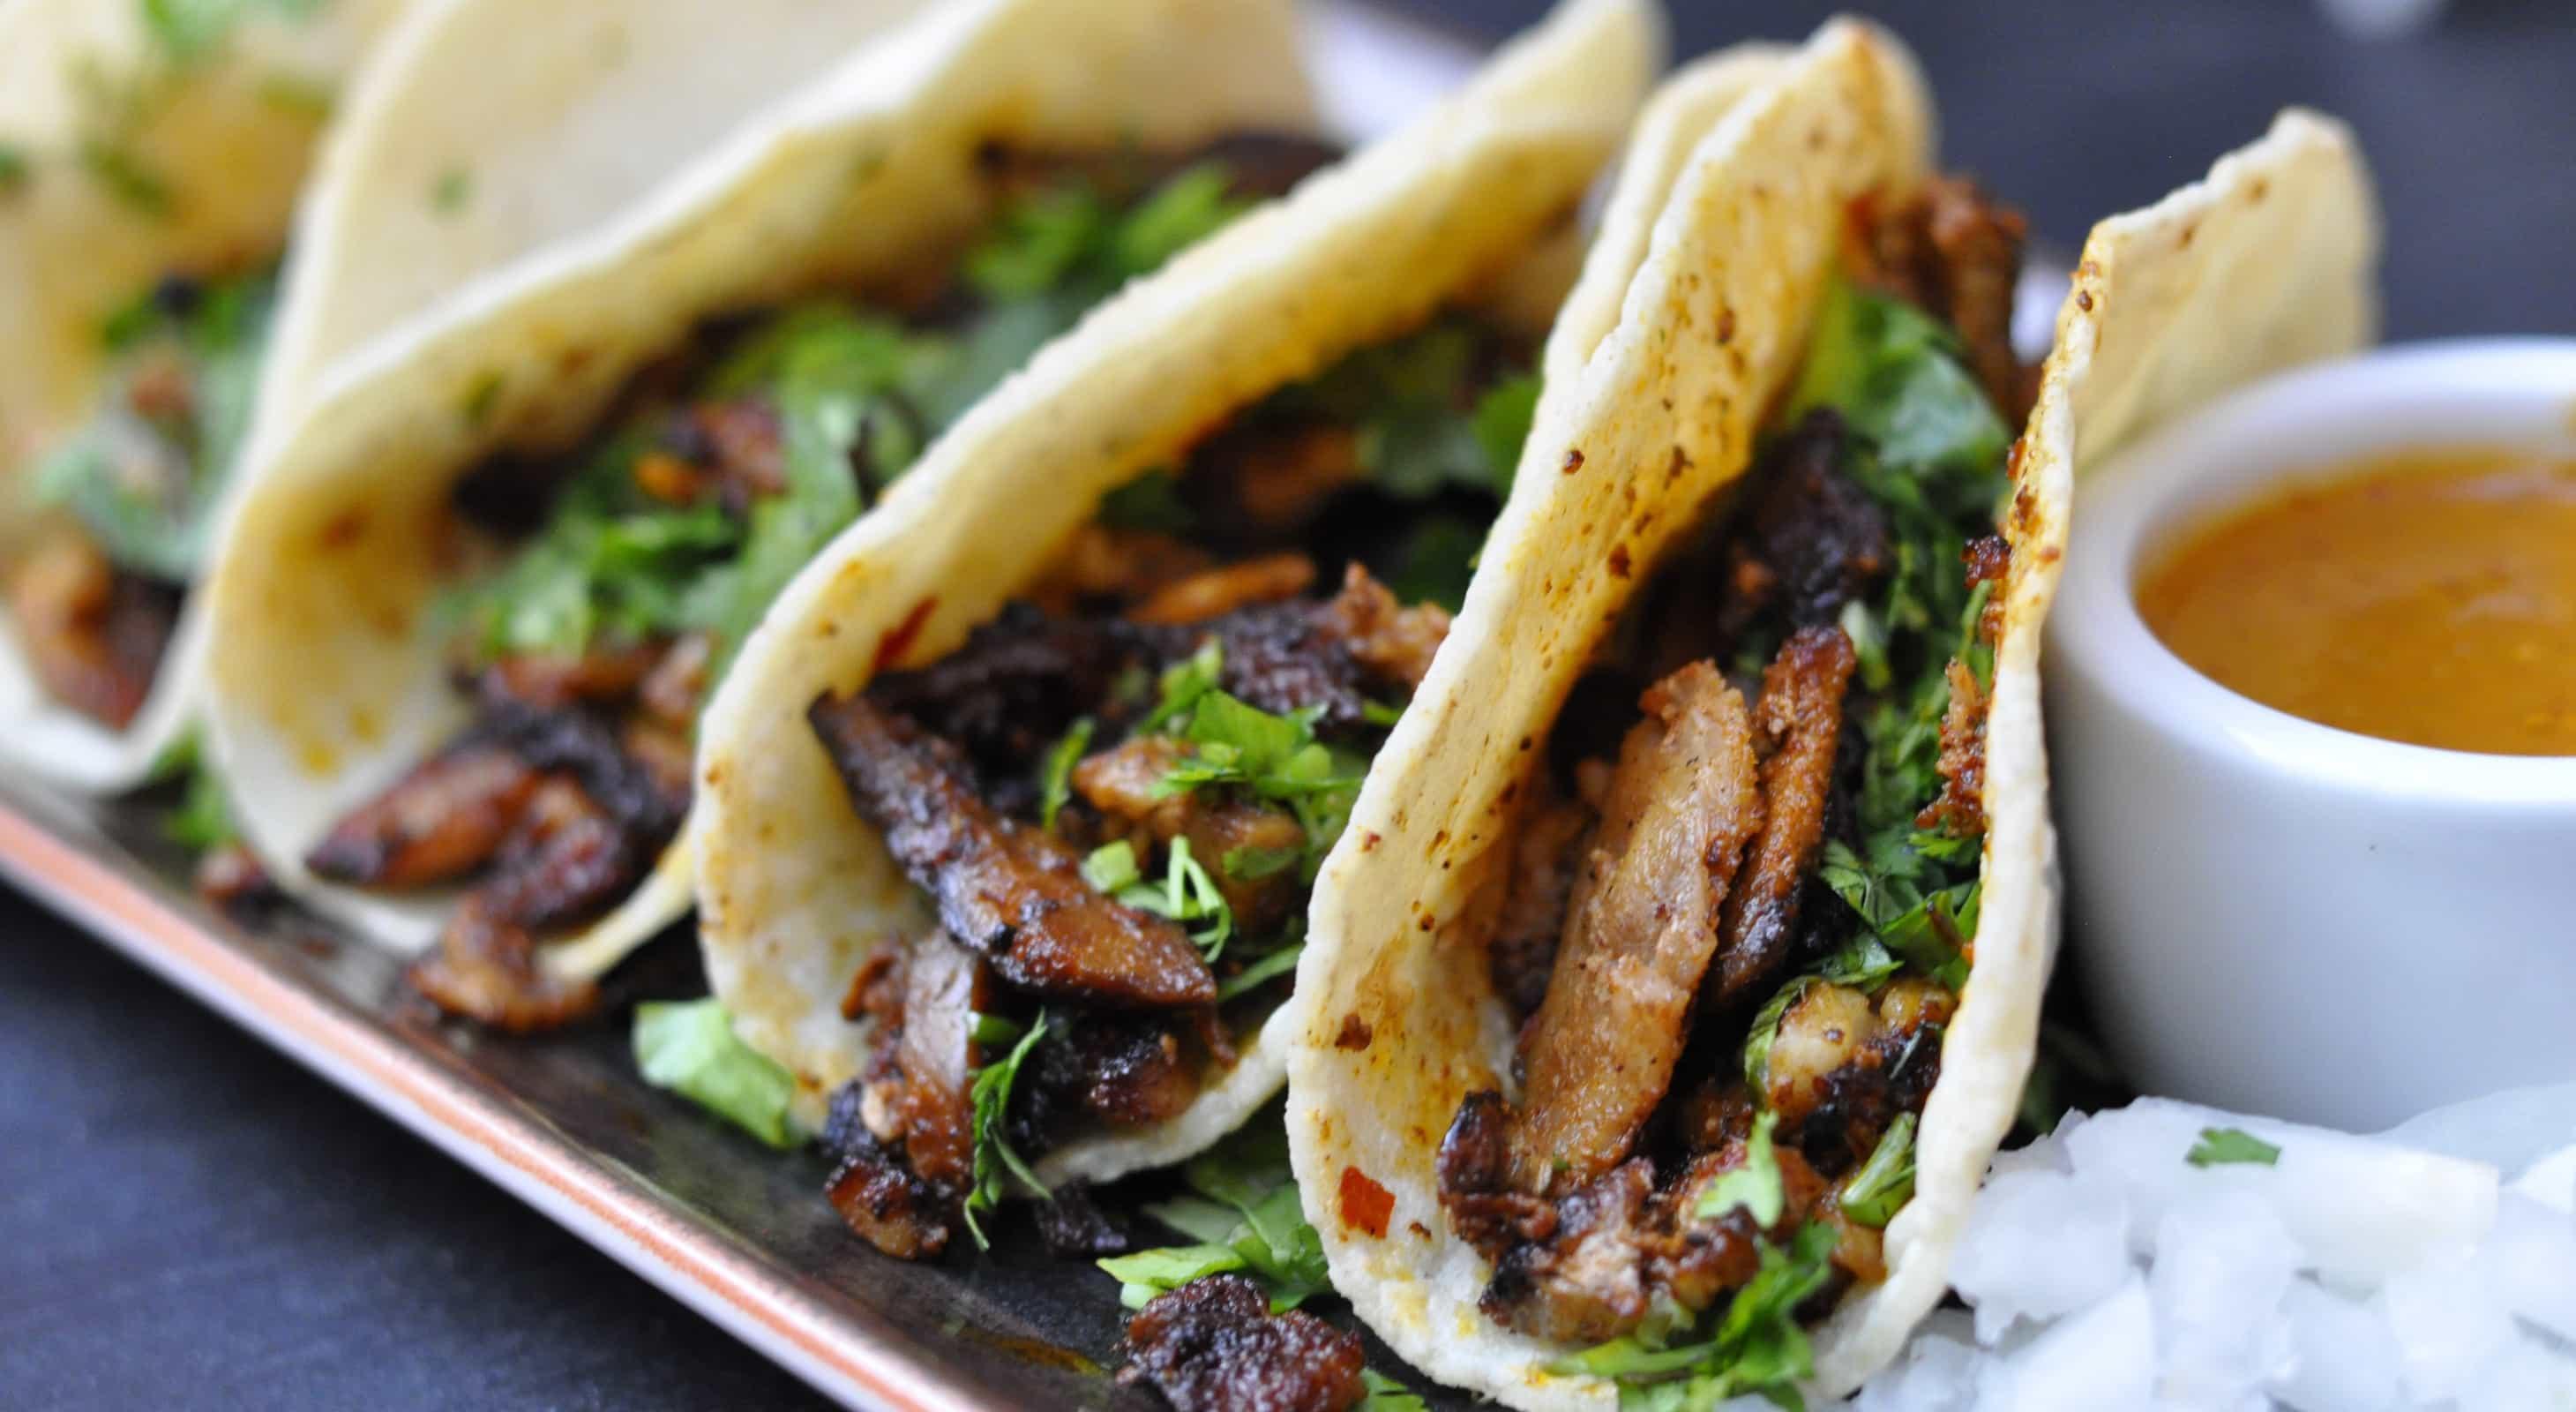 street tacos - Restaurants in Tucson, AZ